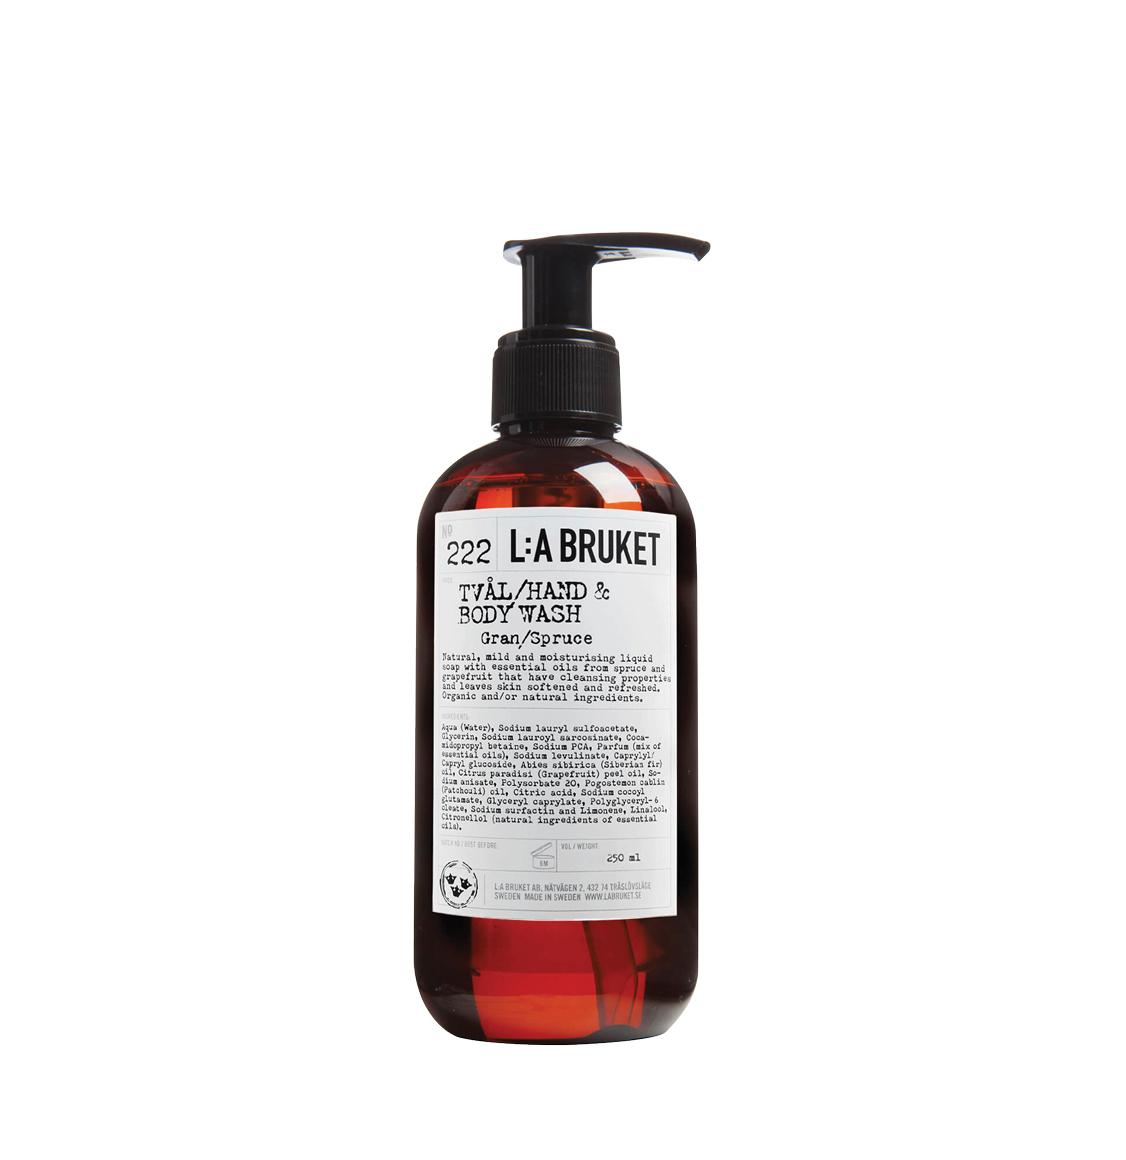 LA Bruket 222 Hand and Body Wash Spruce 240ml